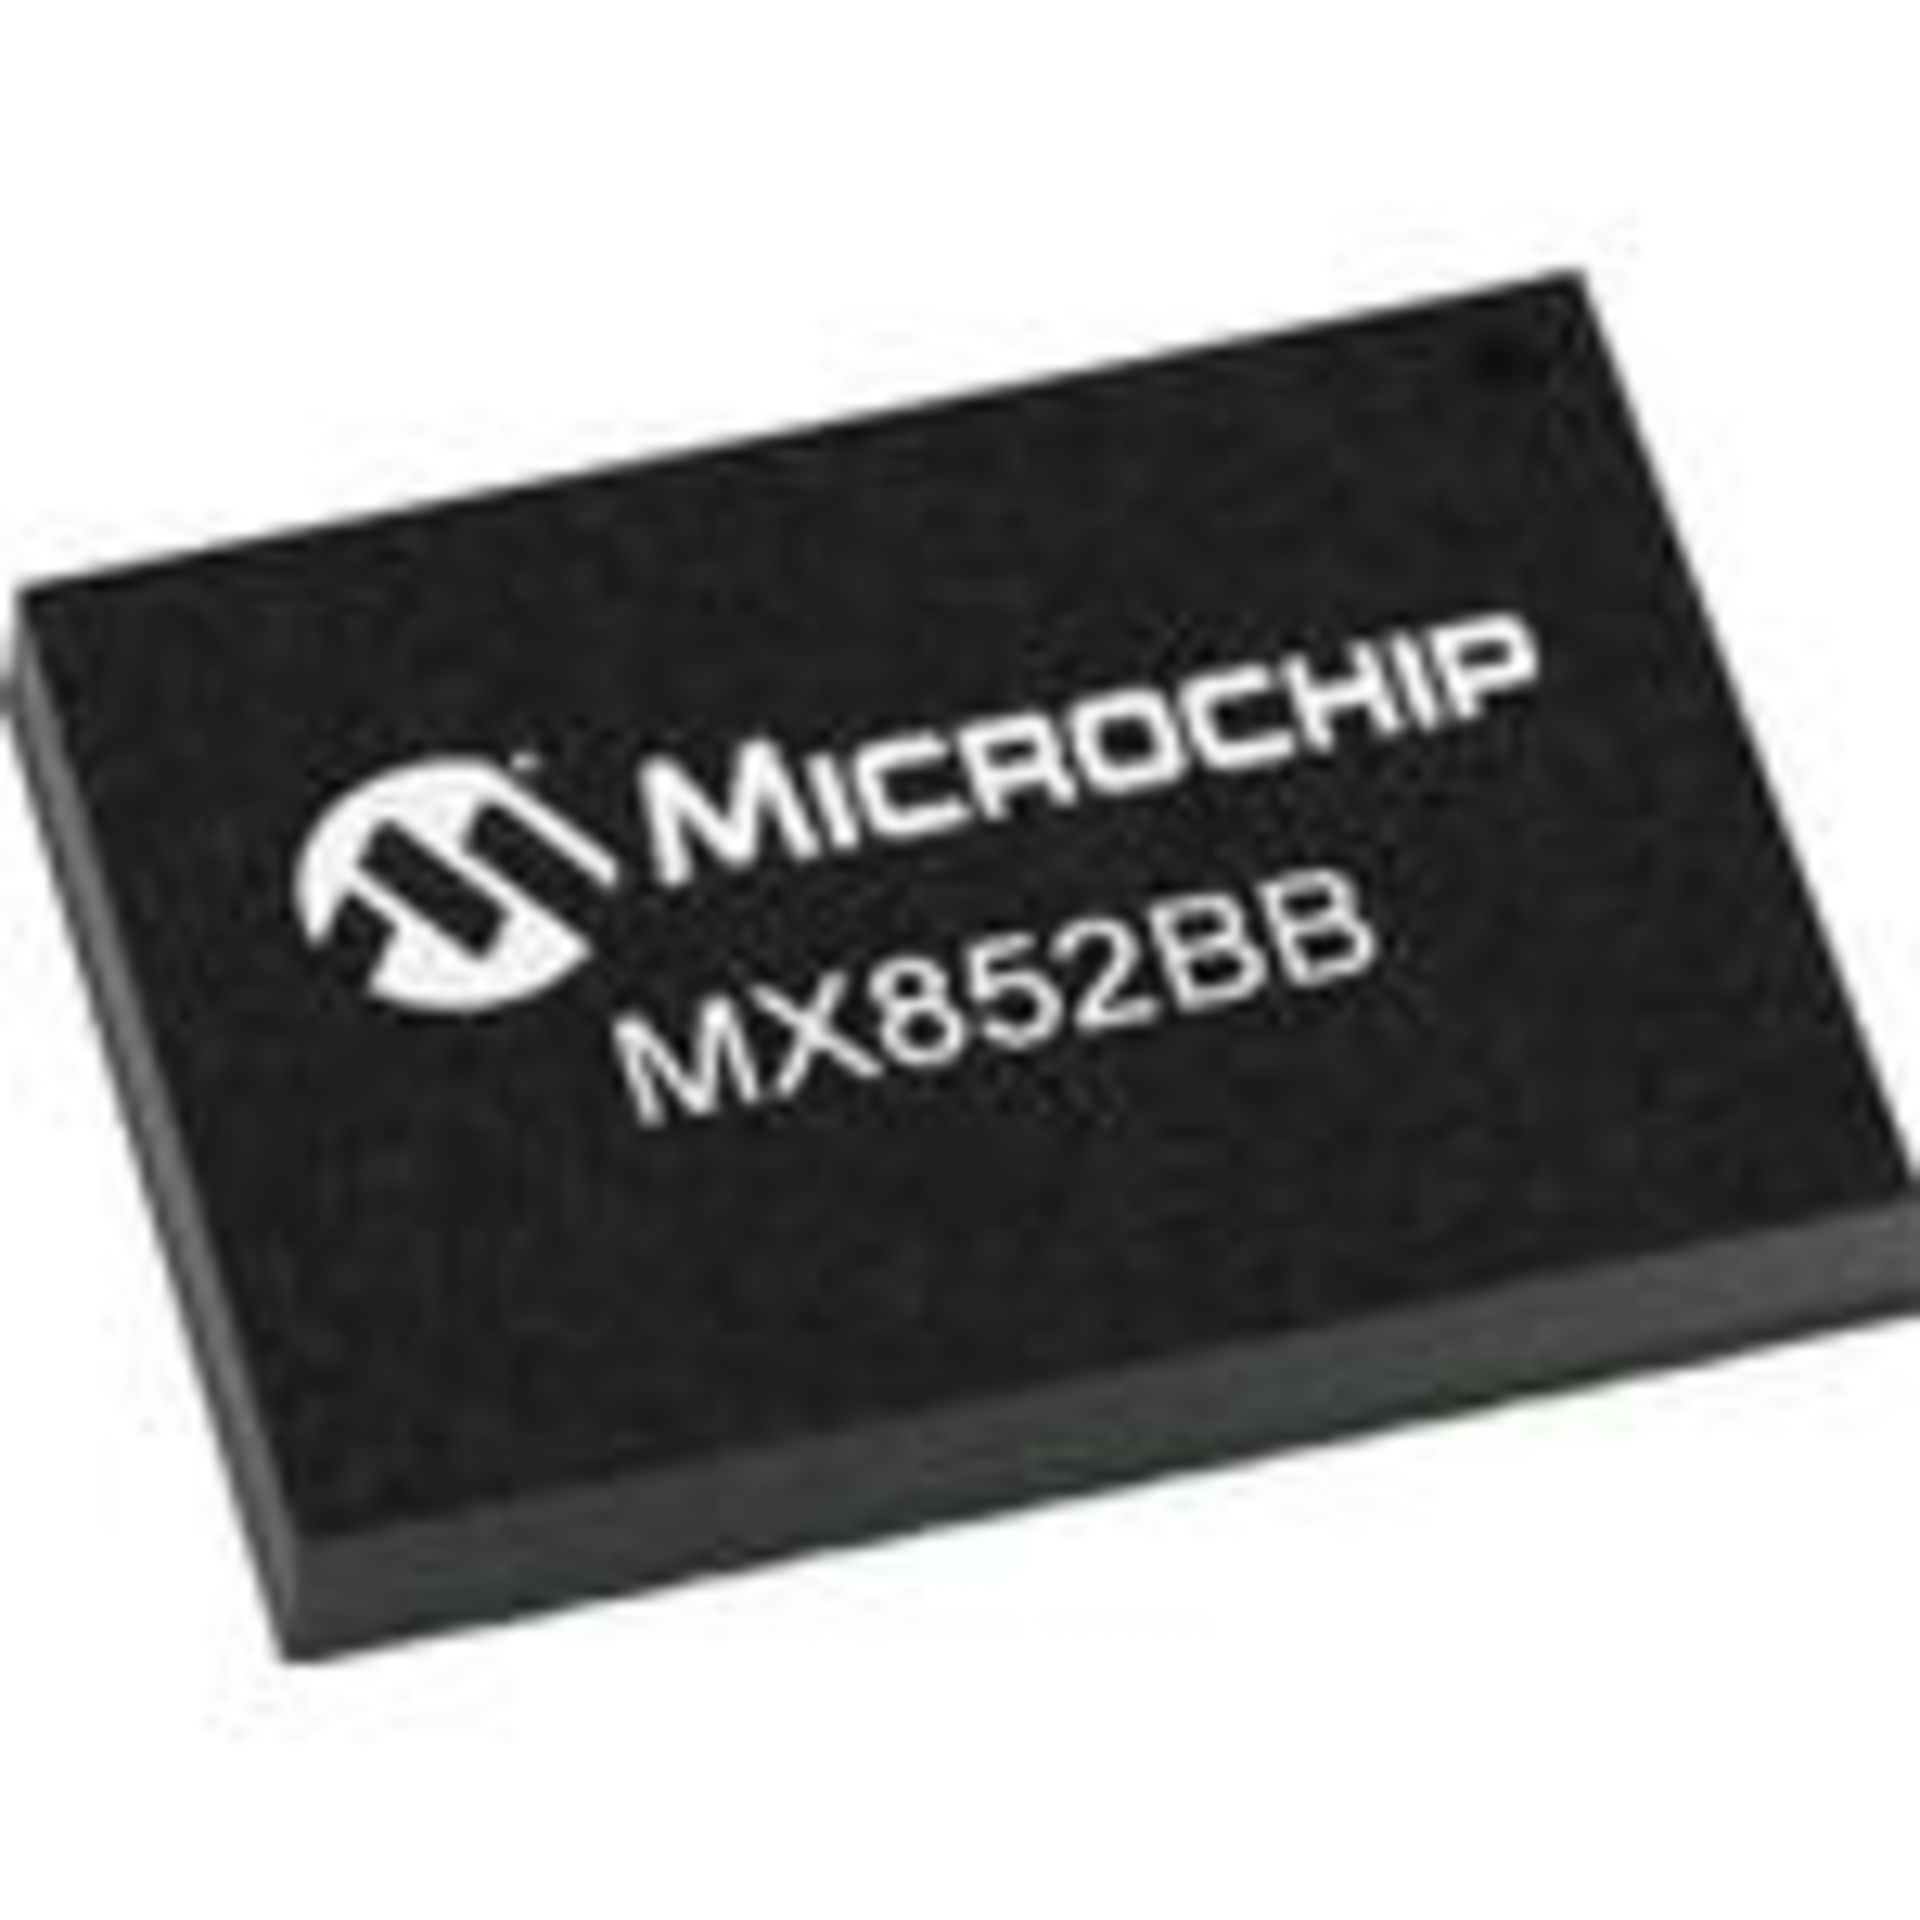 Microchip Technology MX852BB0030 SMD Crystal Oscillators, Oscillator XO, 156.25MHz, ±50ppm, HCSL